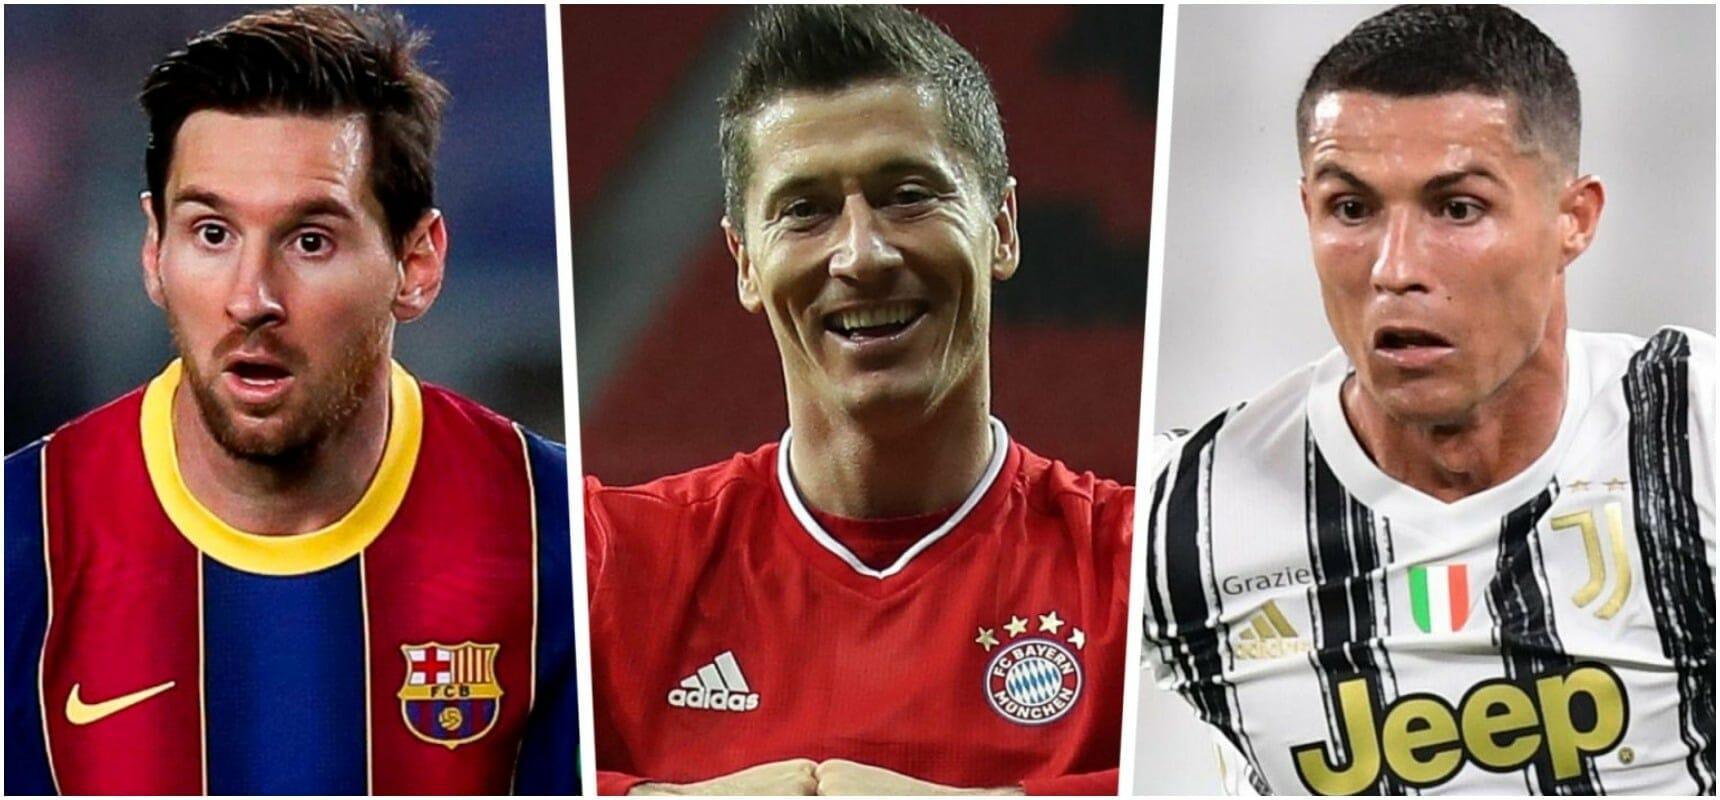 Messi x Lewandoski x C. Ronaldo